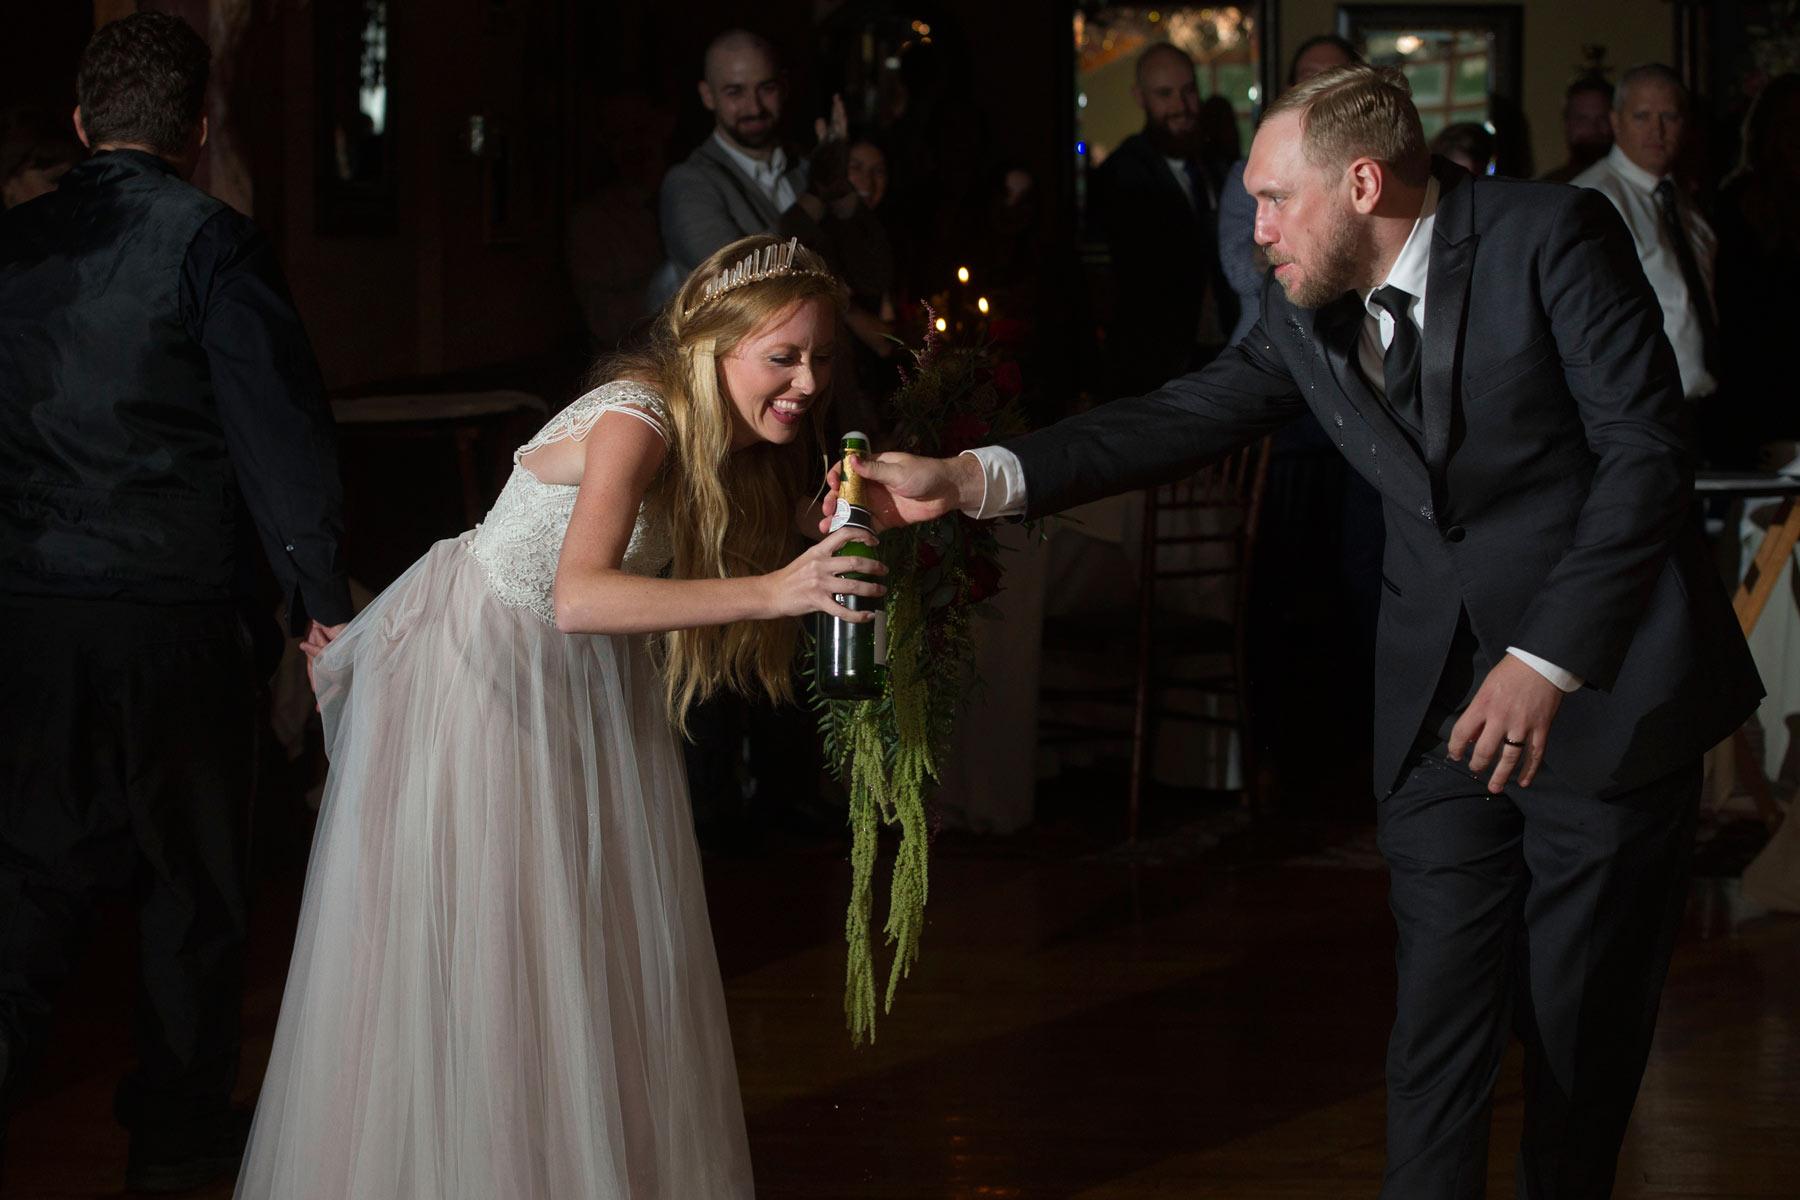 Bucks_County_wedding_photographer_Stroudsmoor_country_inn_wedding_Philadelphia_wedding_photographer_27_bride_groom_entrance.JPG